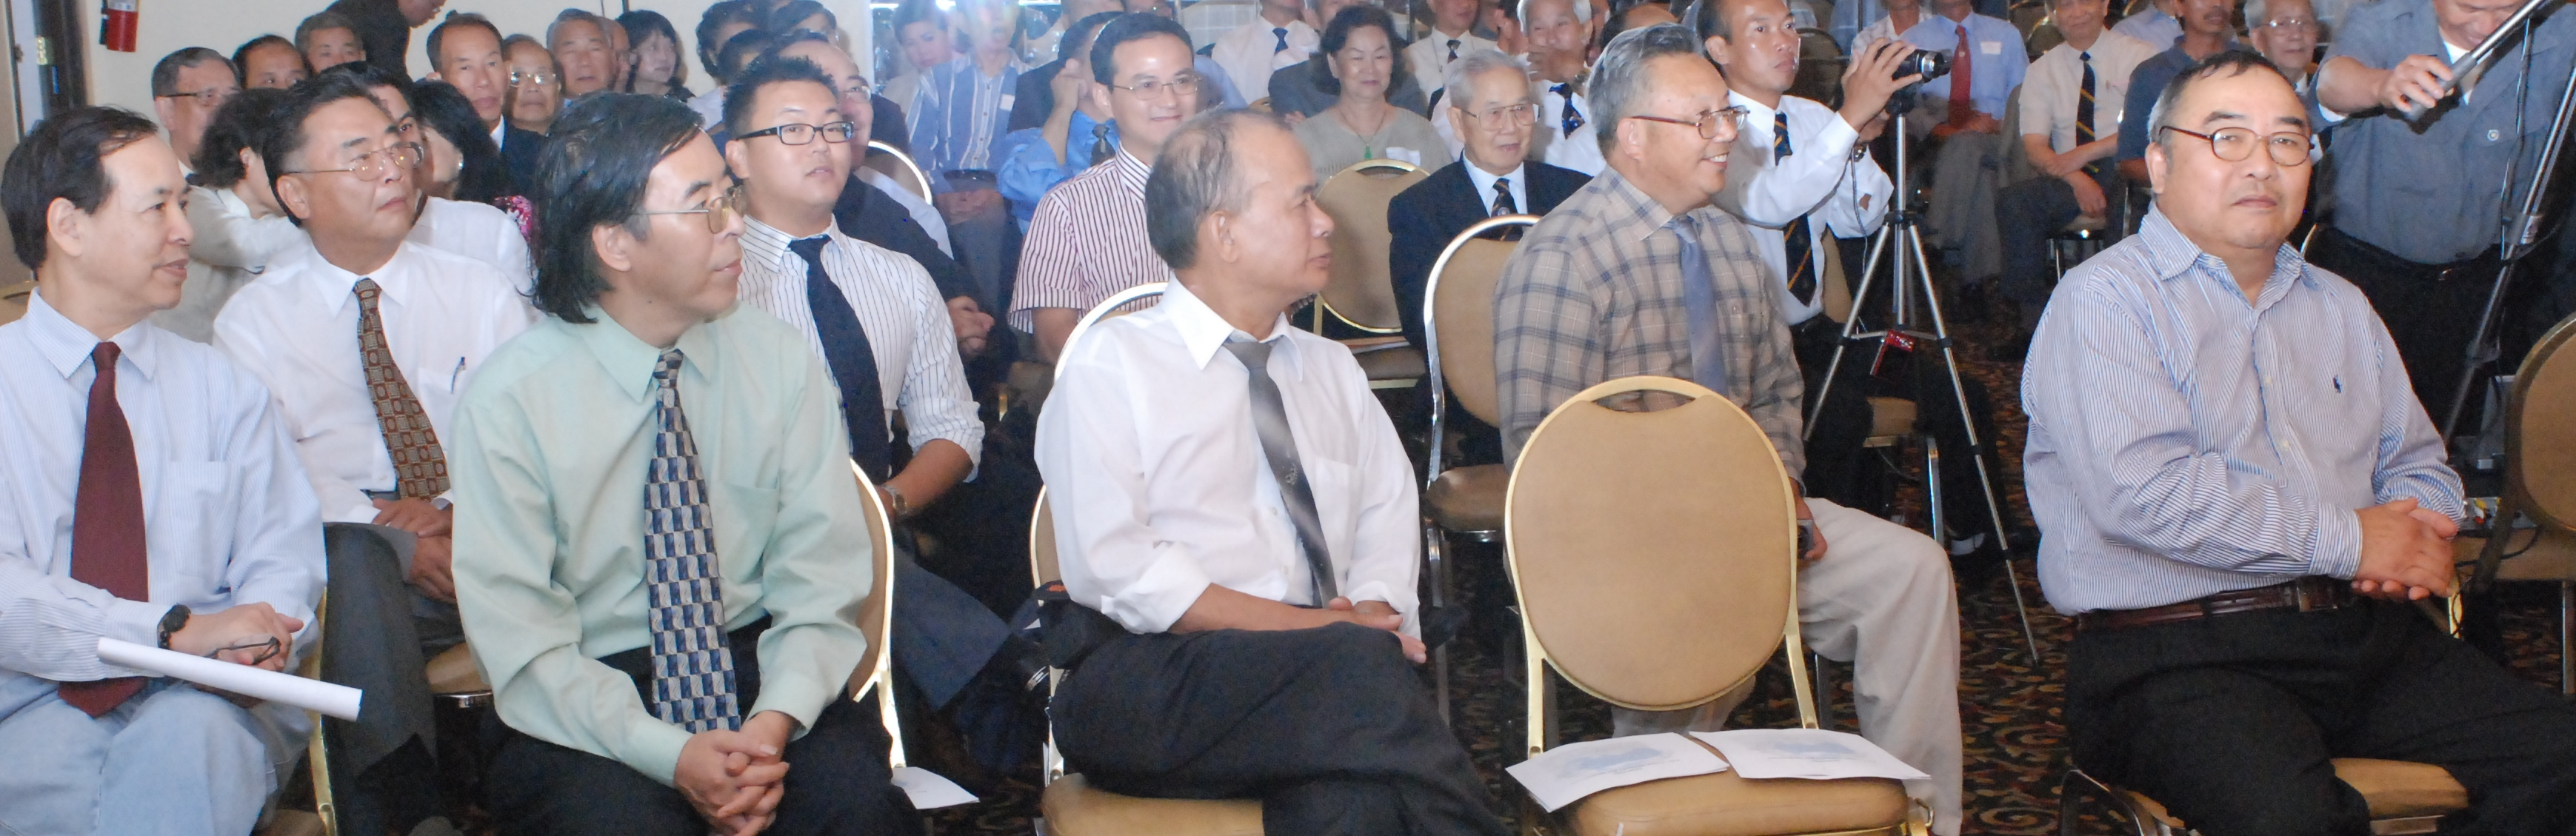 phai doan Lien Minh den Dai Hoi DDTVN (5-9-09)